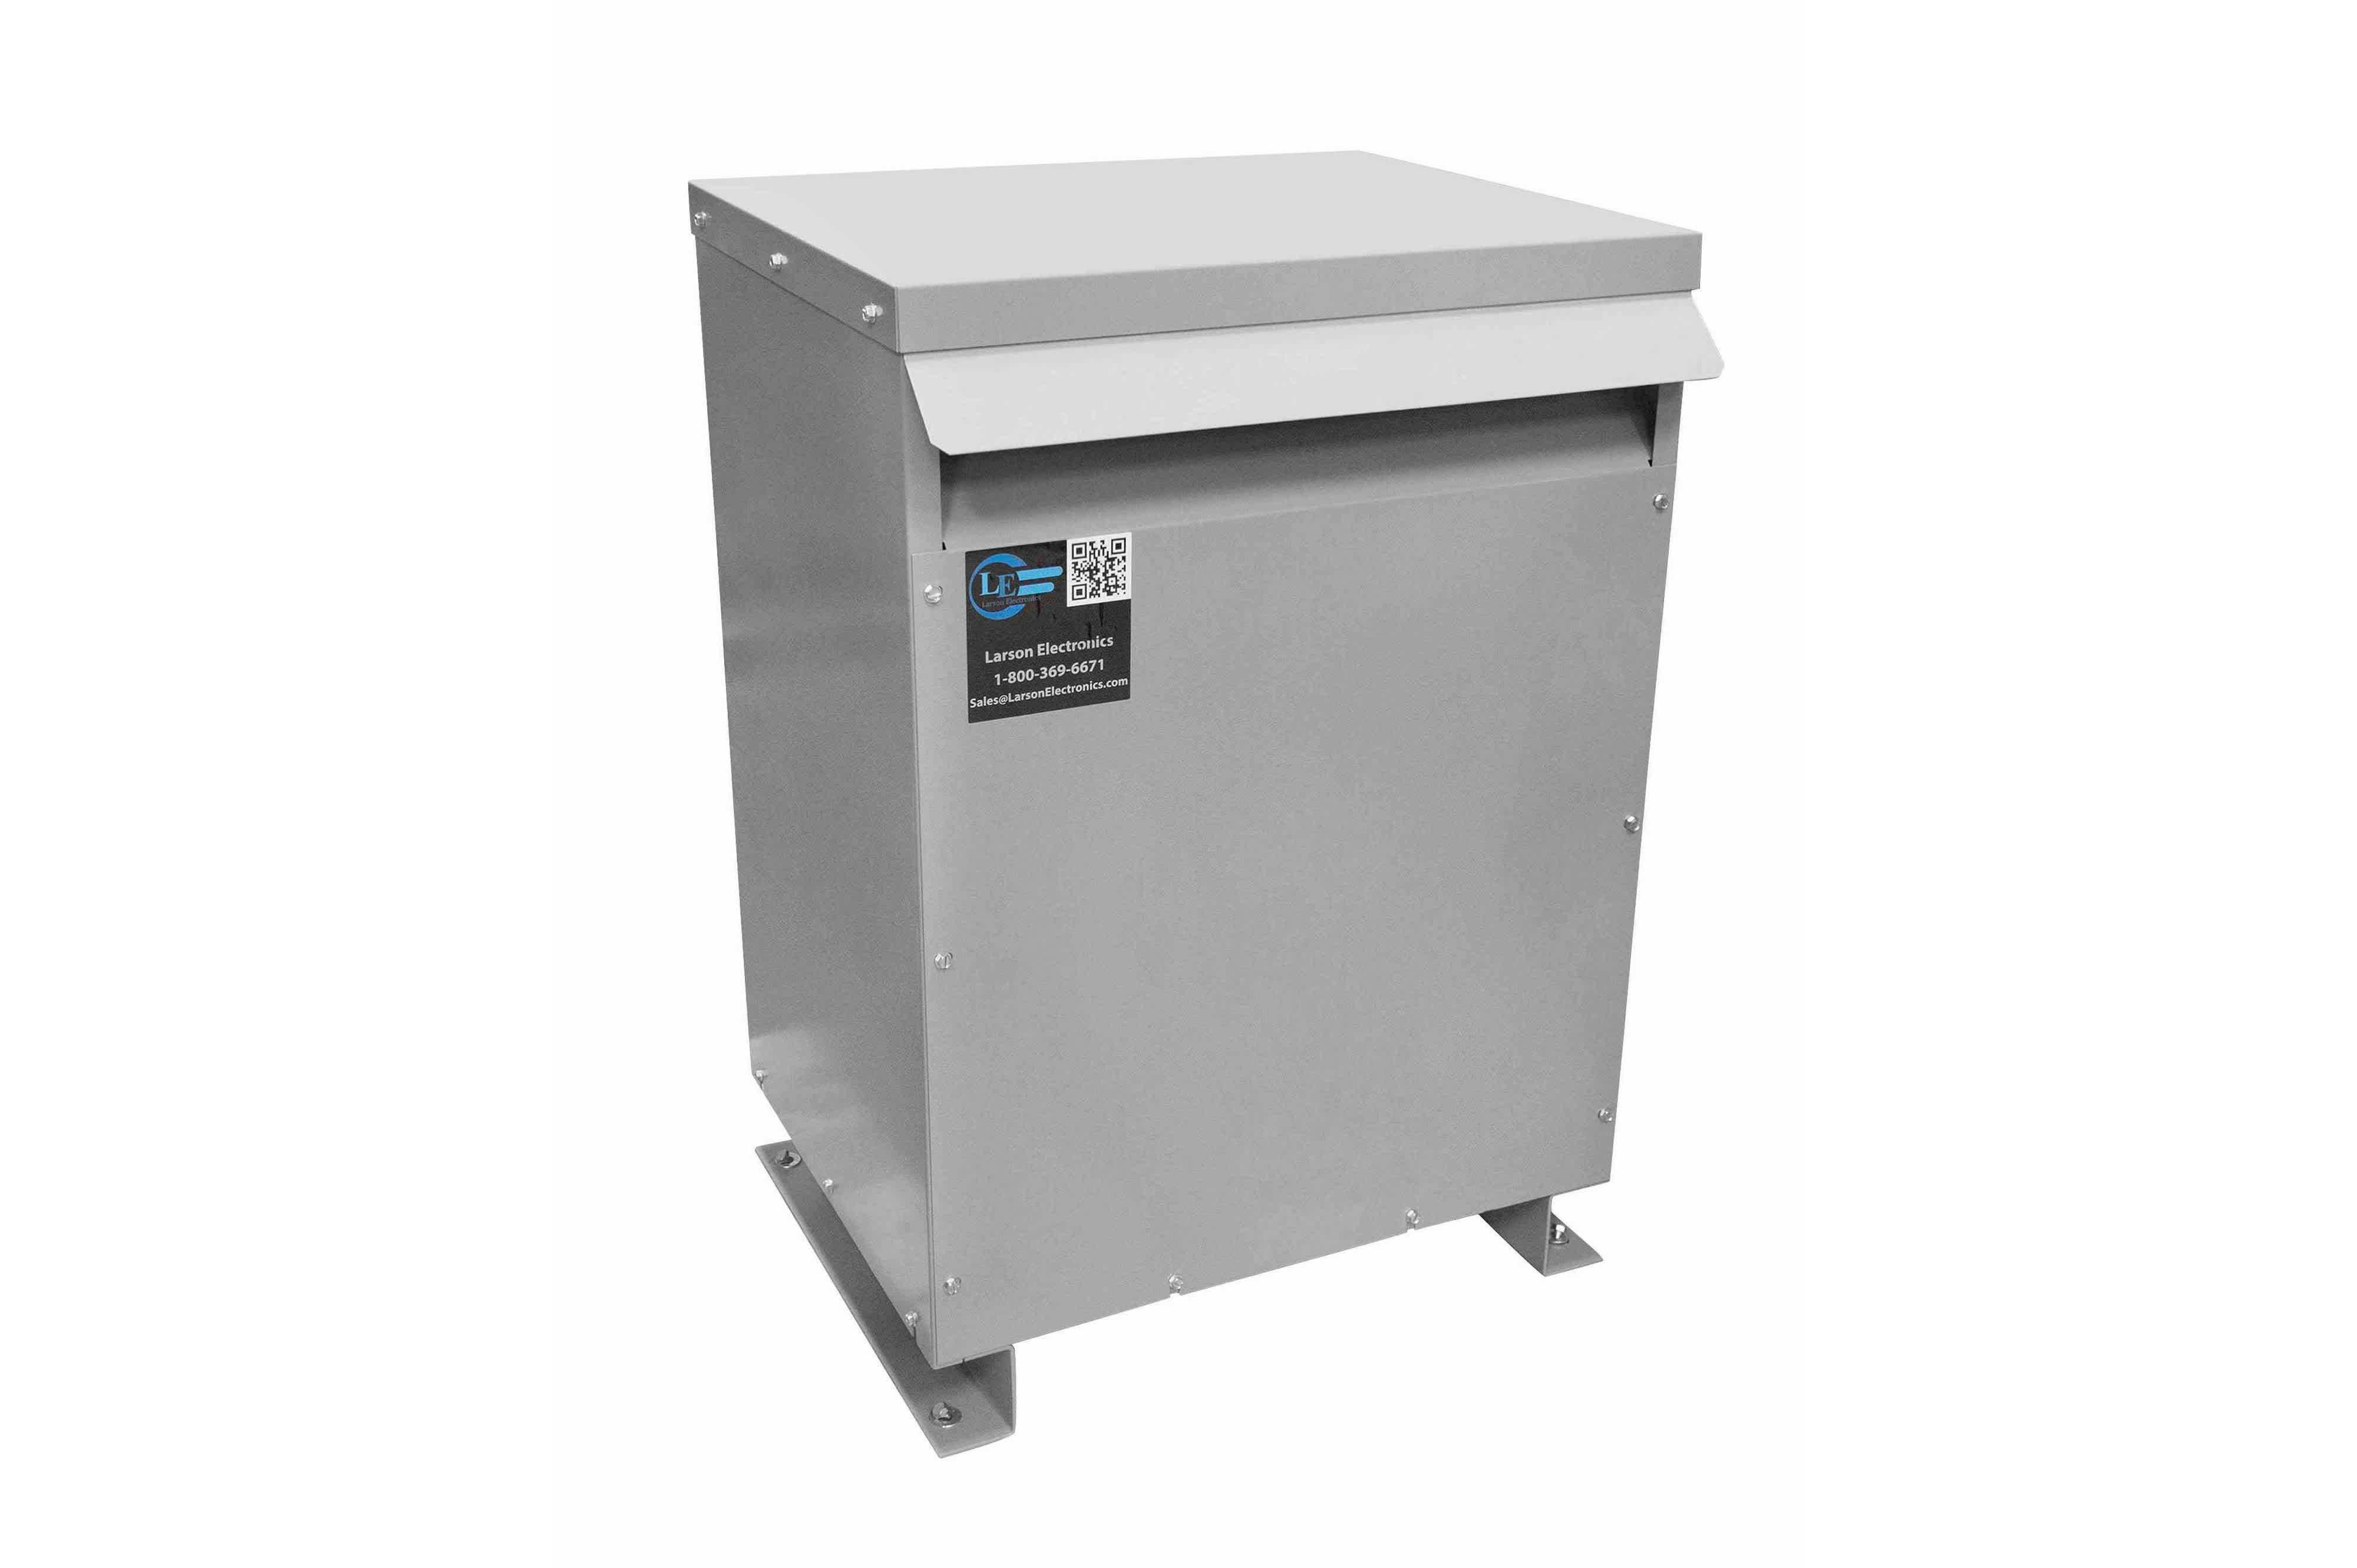 30 kVA 3PH Isolation Transformer, 460V Wye Primary, 380Y/220 Wye-N Secondary, N3R, Ventilated, 60 Hz